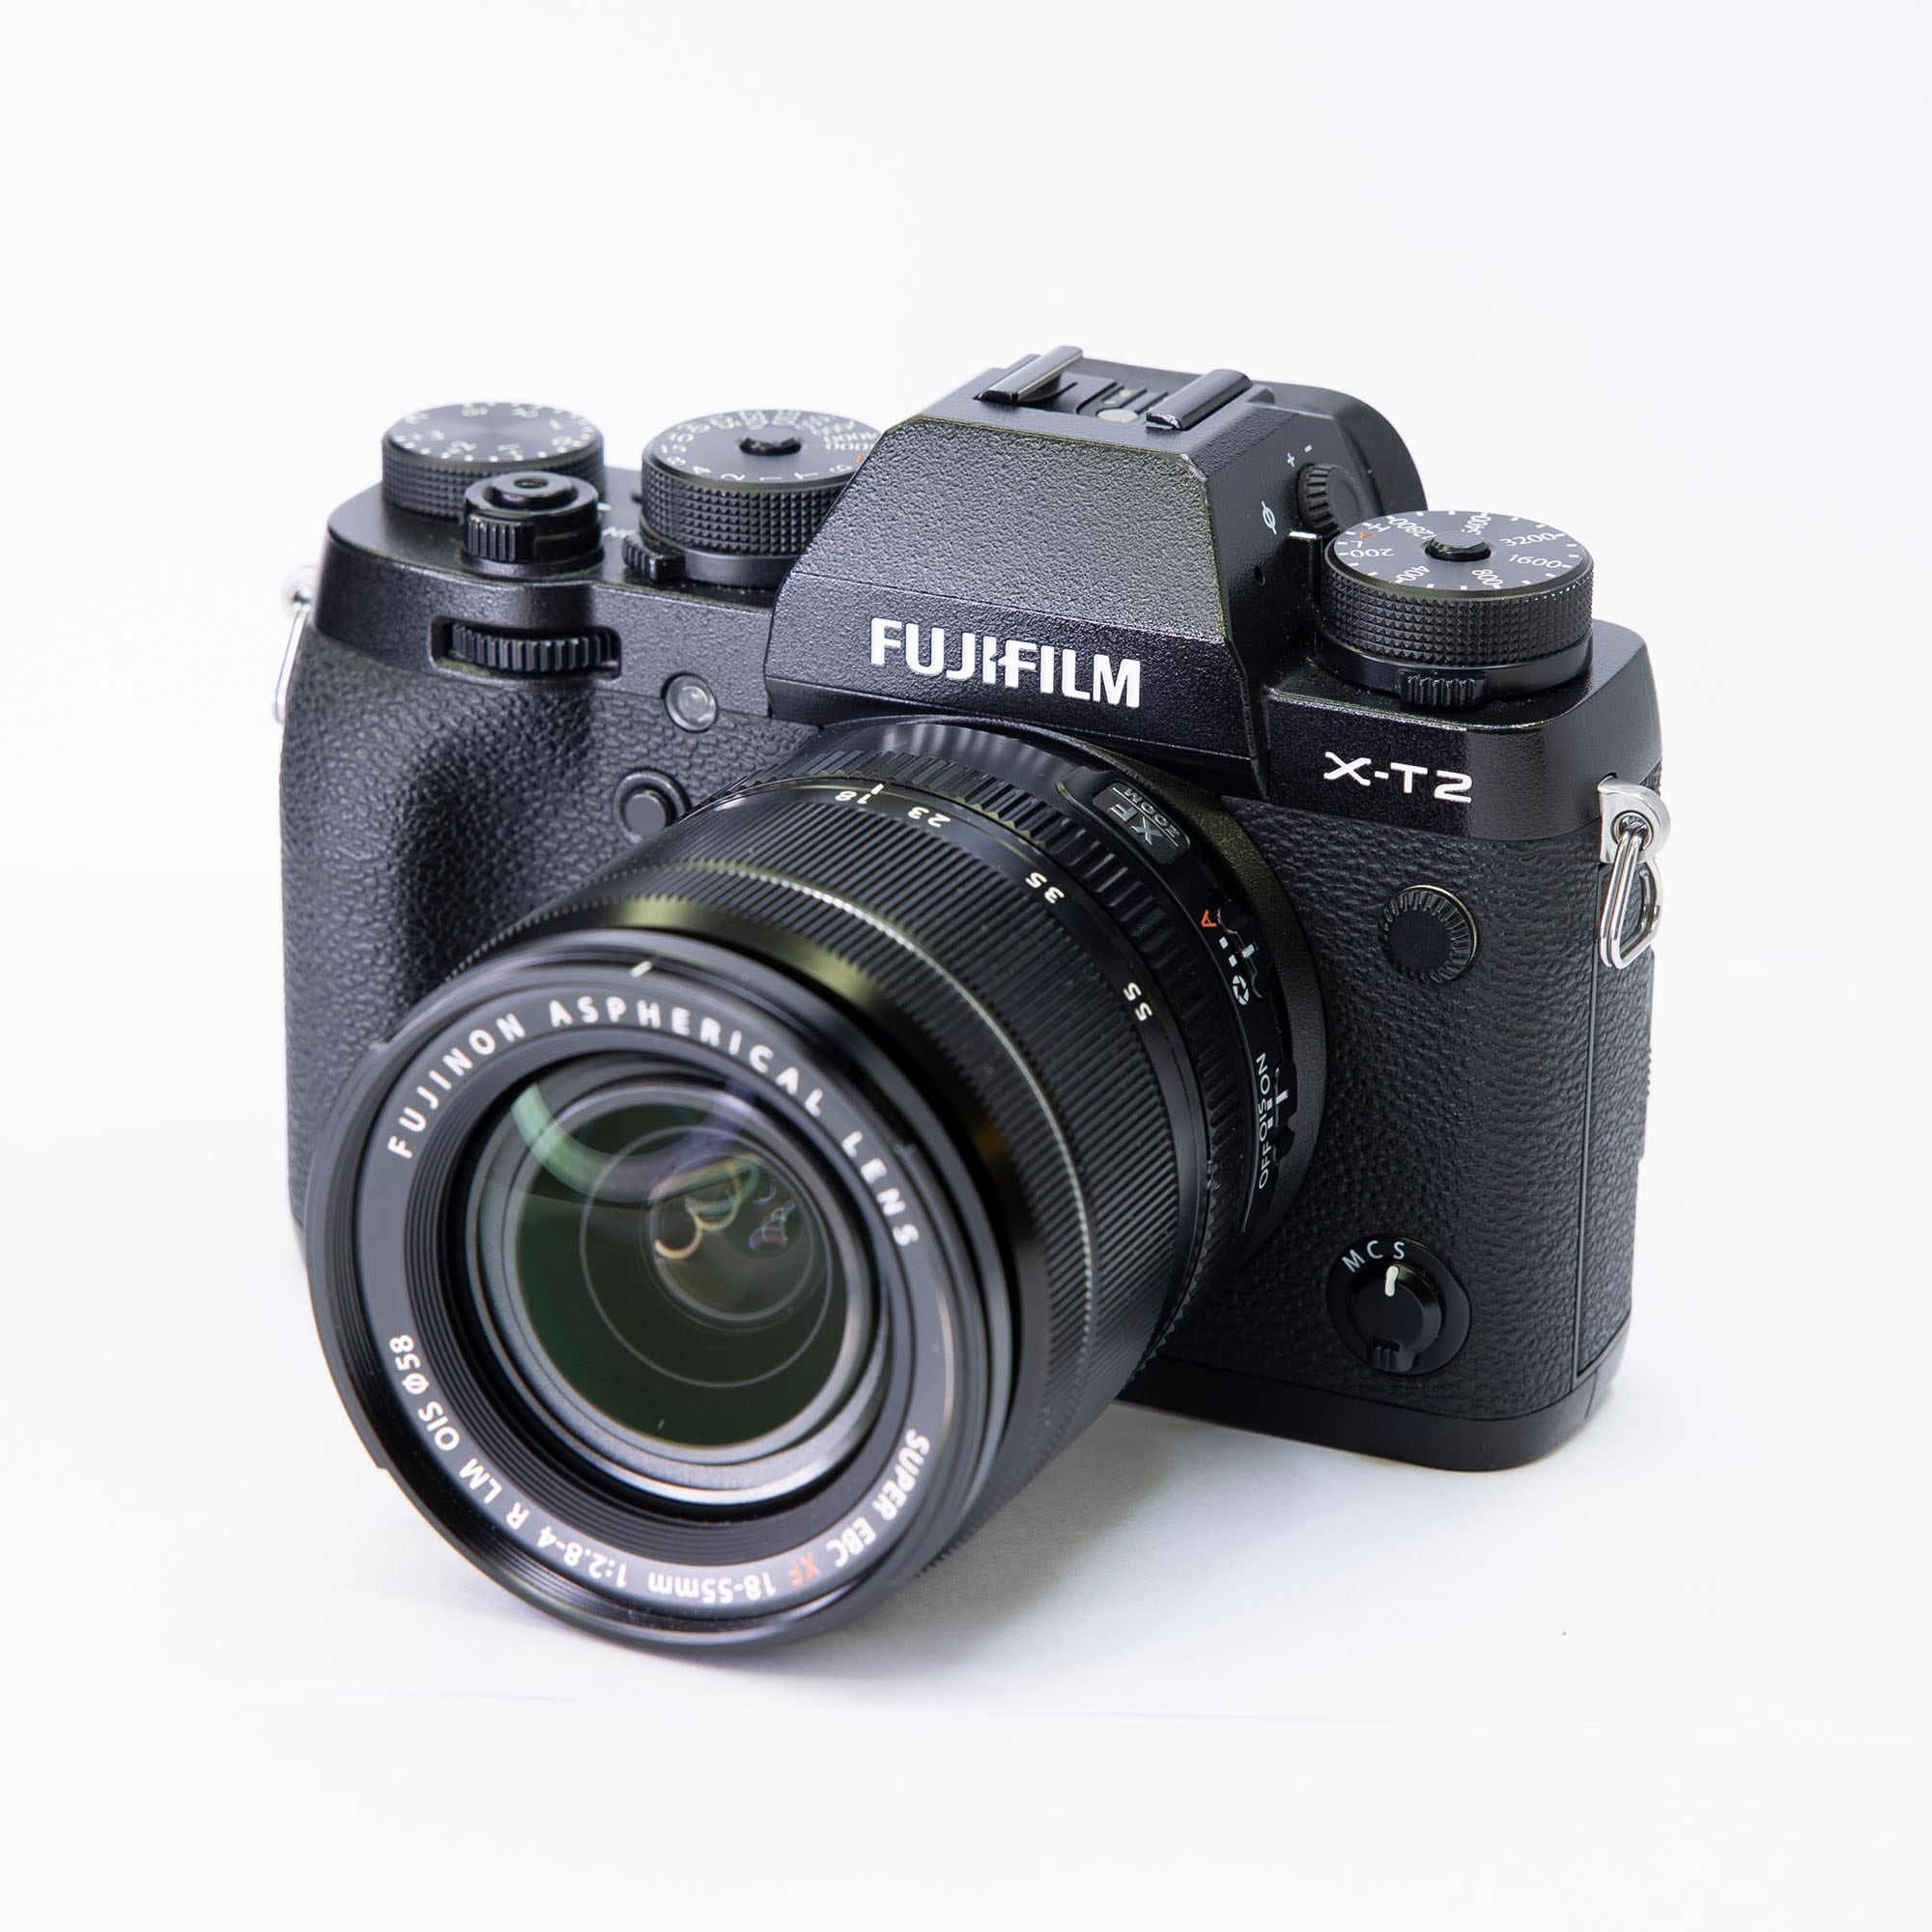 Fujifilm X-T2 + 18-55 - BEGAGNAT